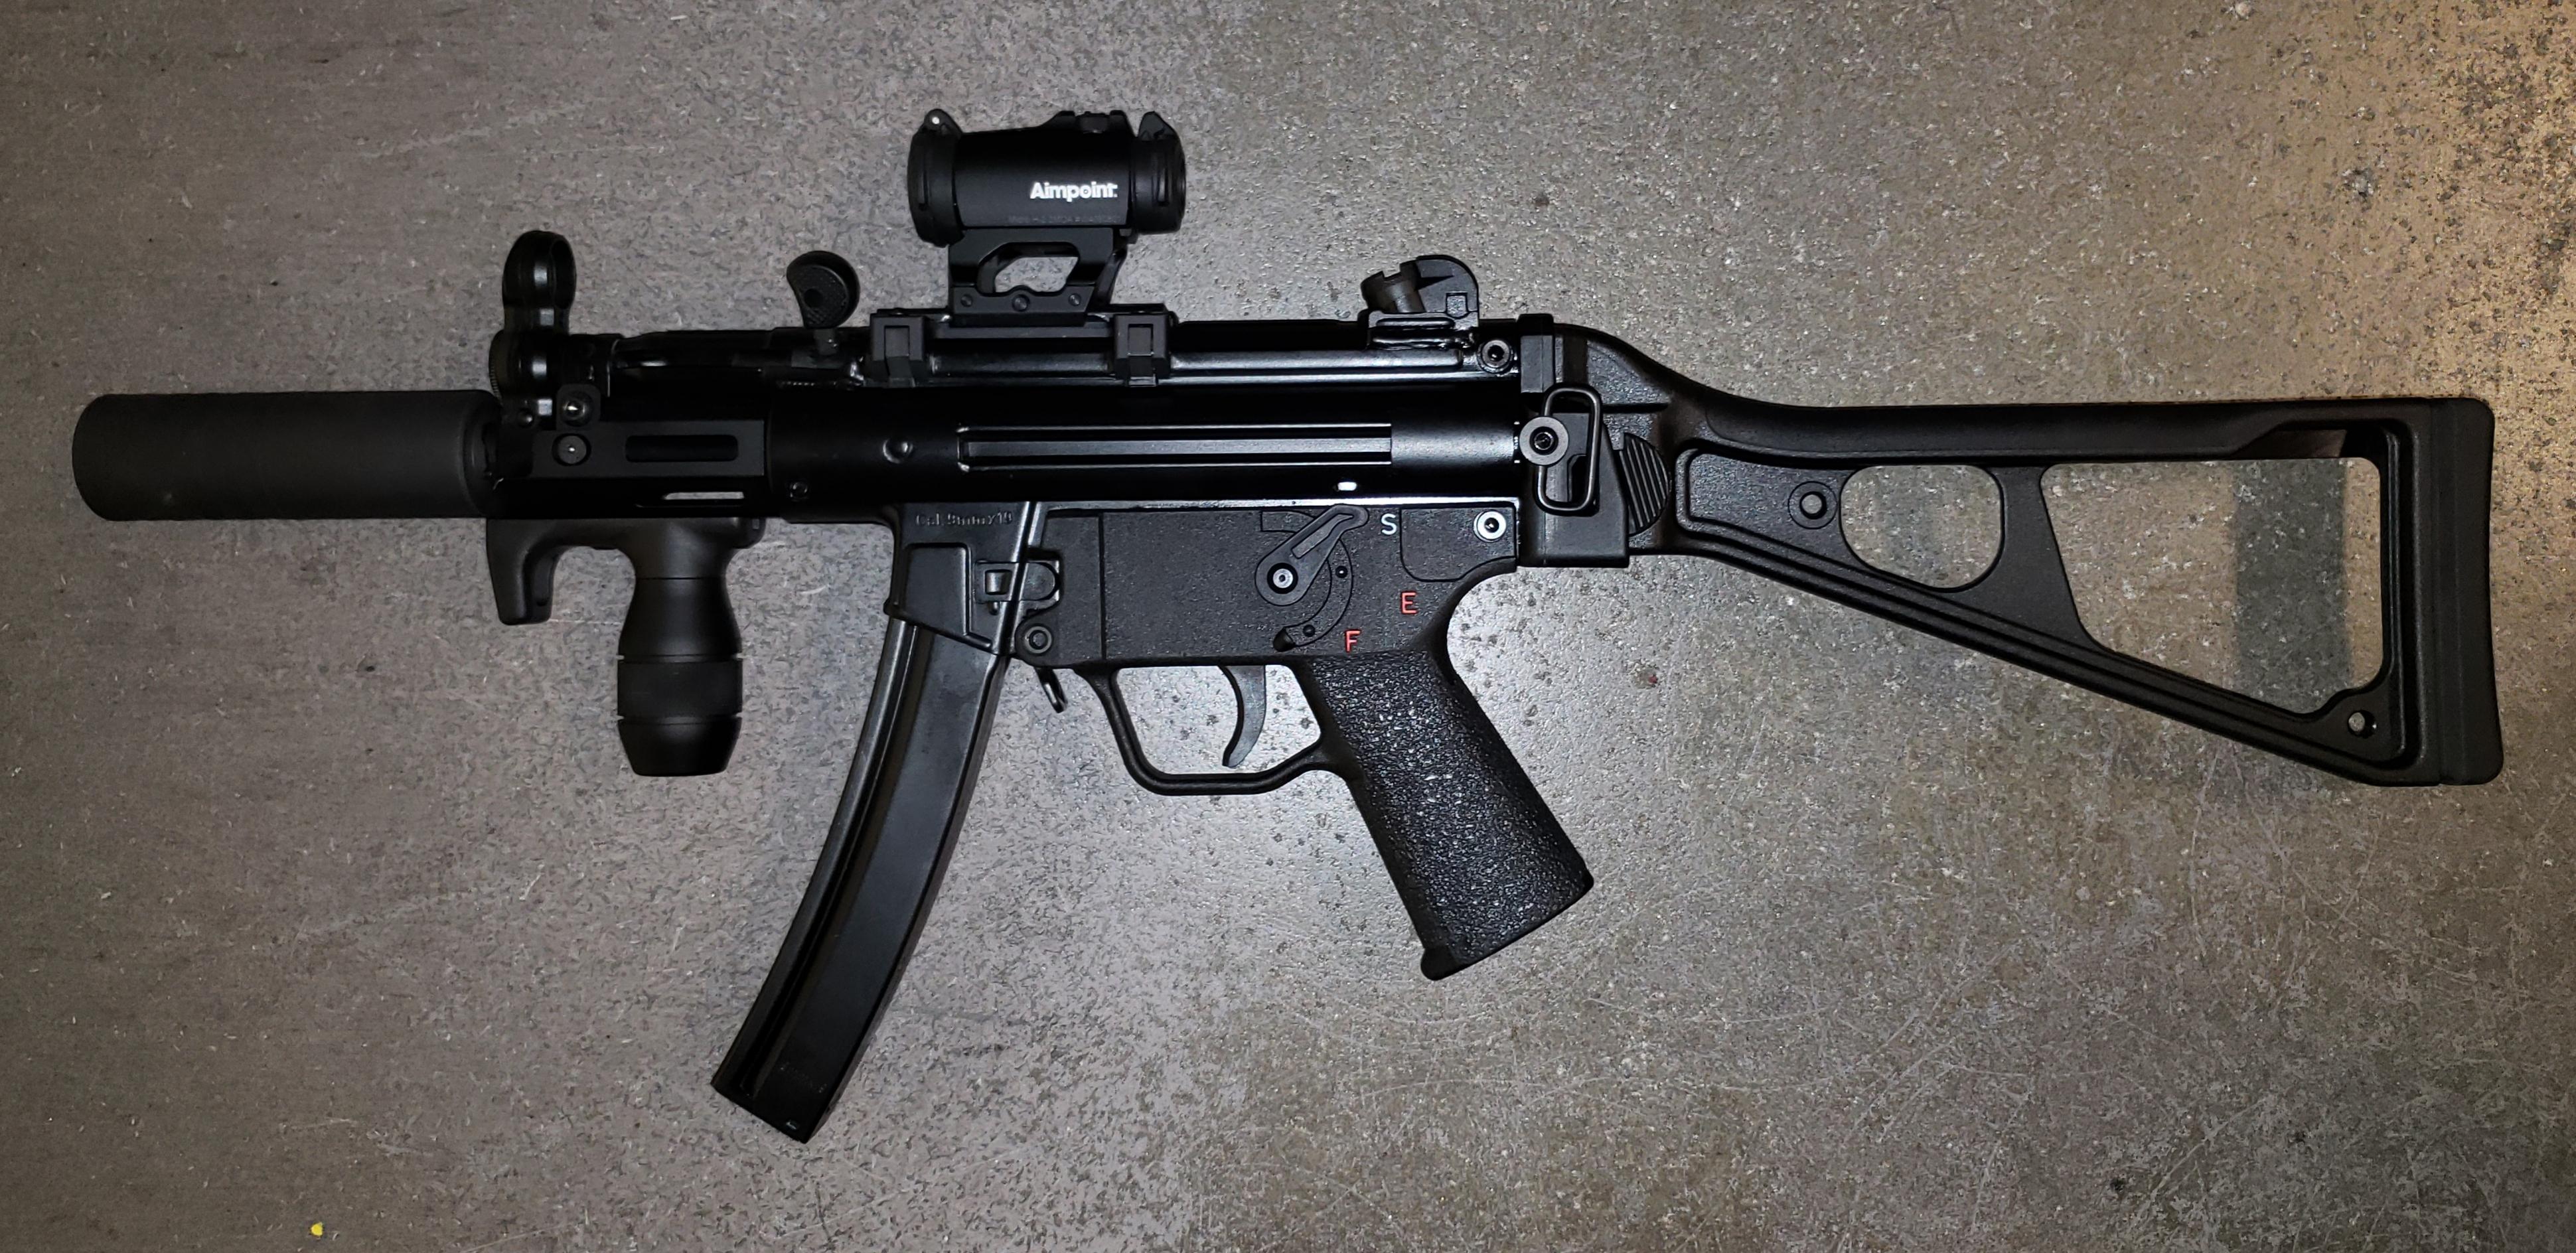 EDIT with Photos: Review of A3 Tactical Vert Grip on MI M-LOK MP5 Handguard-20181117_110954.jpg